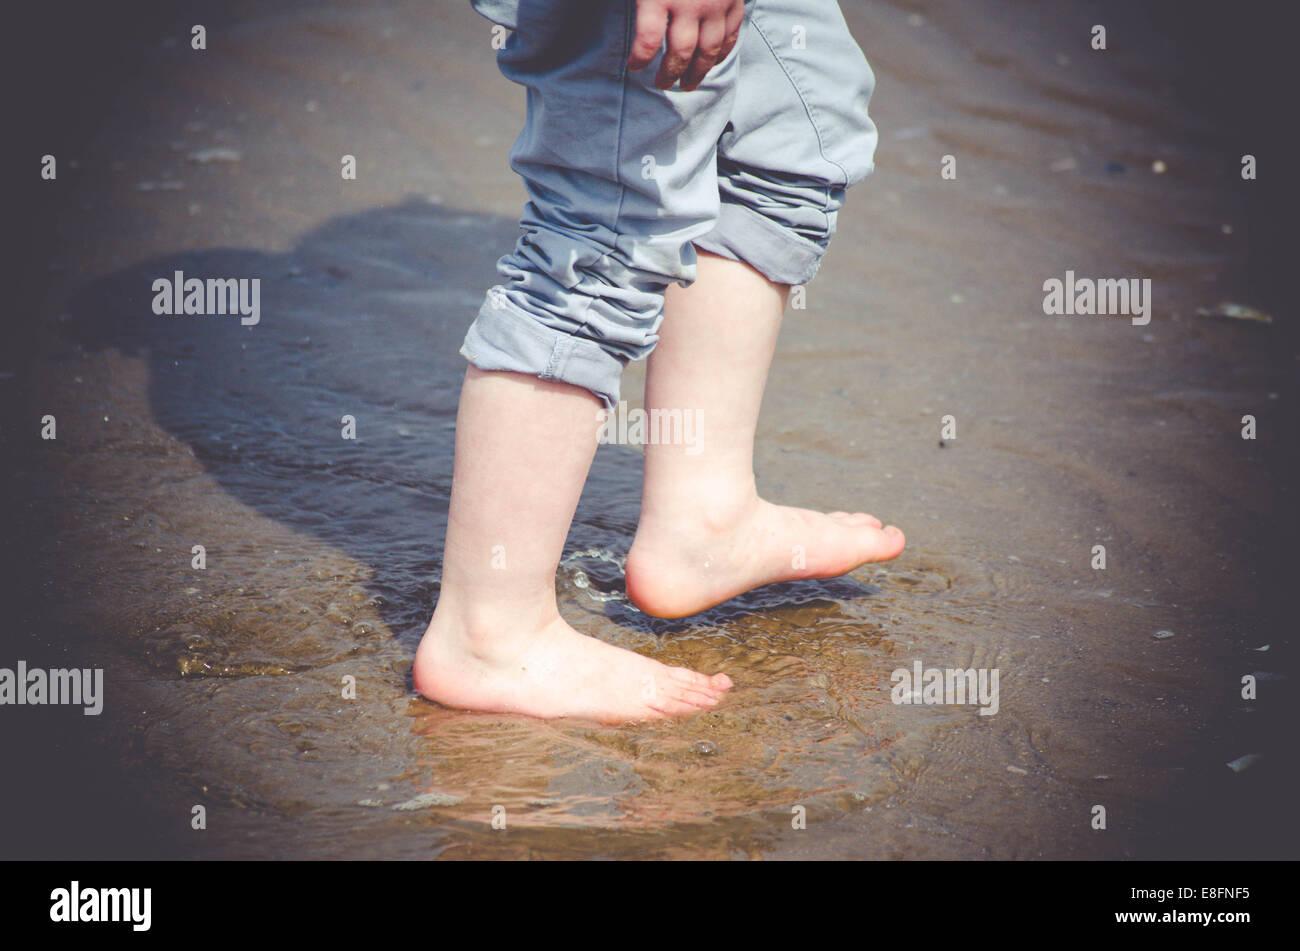 Close-up of boy's legs walking on beach - Stock Image